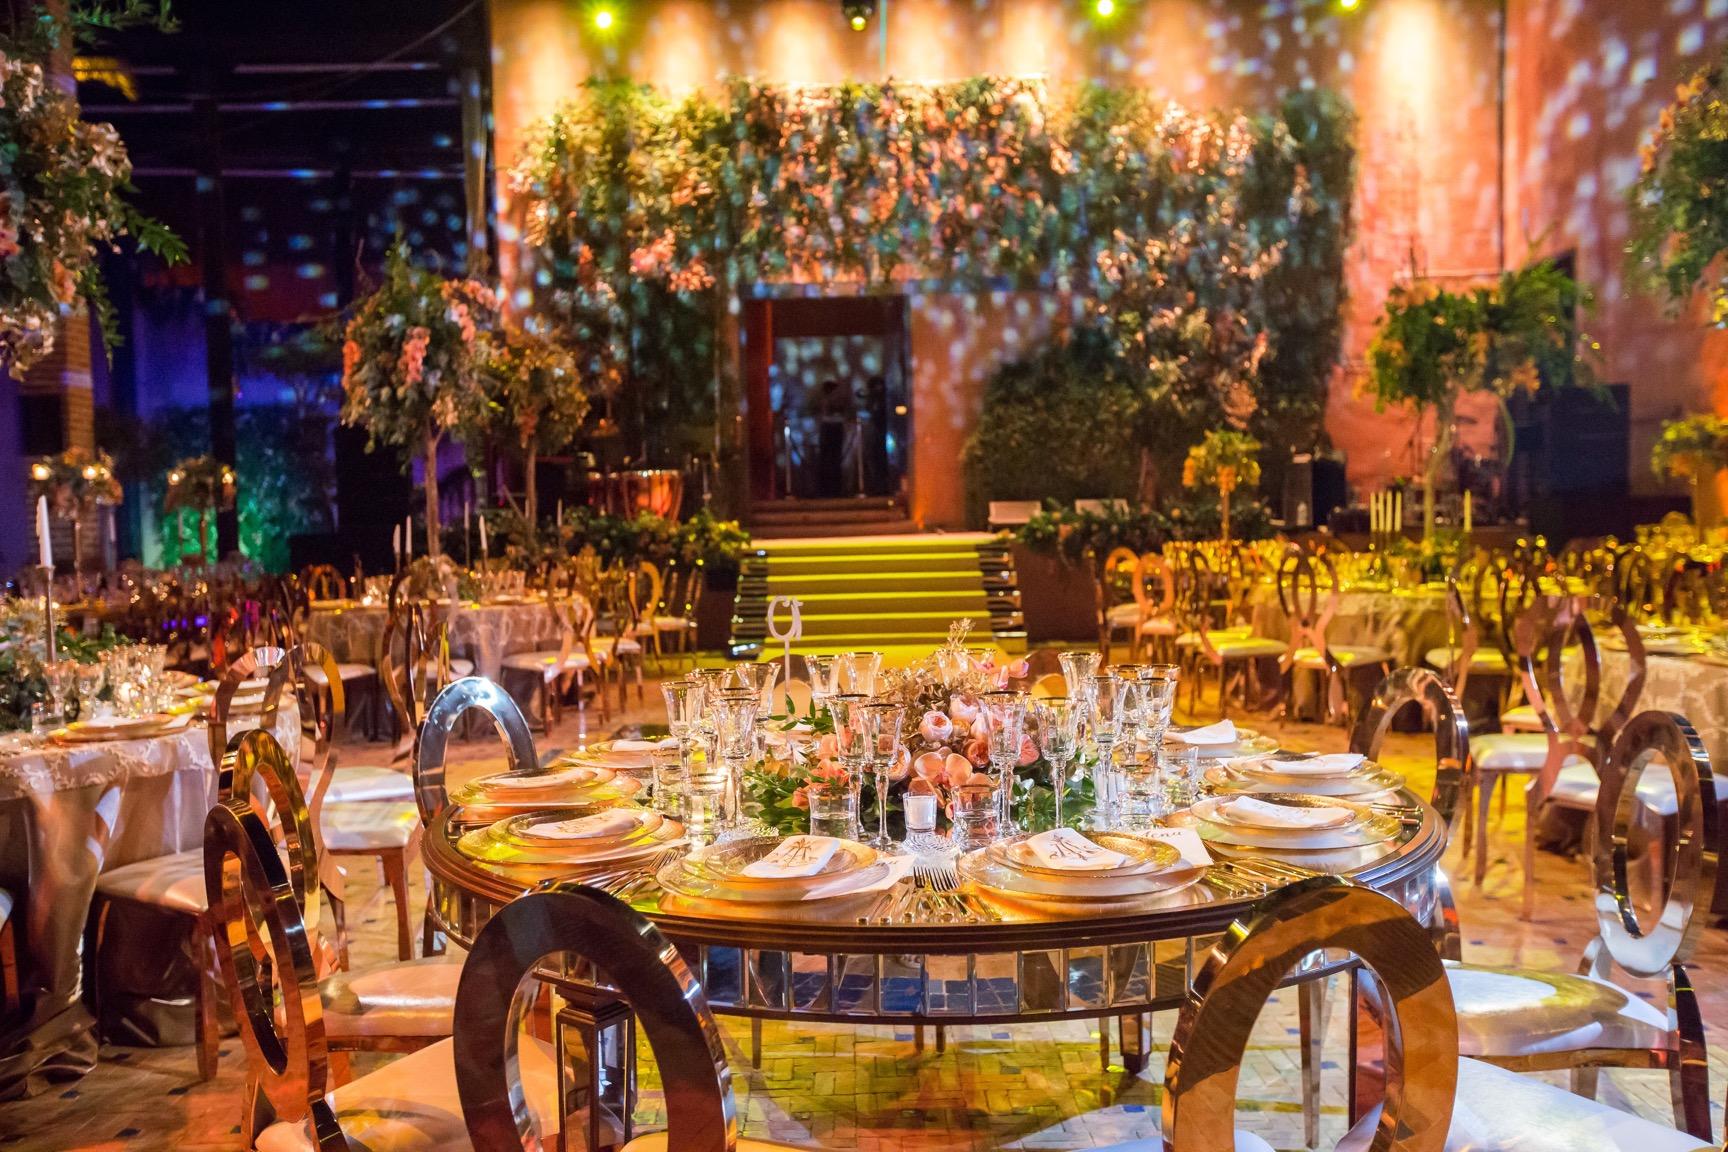 Si-Quiero-Wedding-Planner-By-Sira-Antequera-Bodas-Málaga-Marbella-Miami- L-A-57